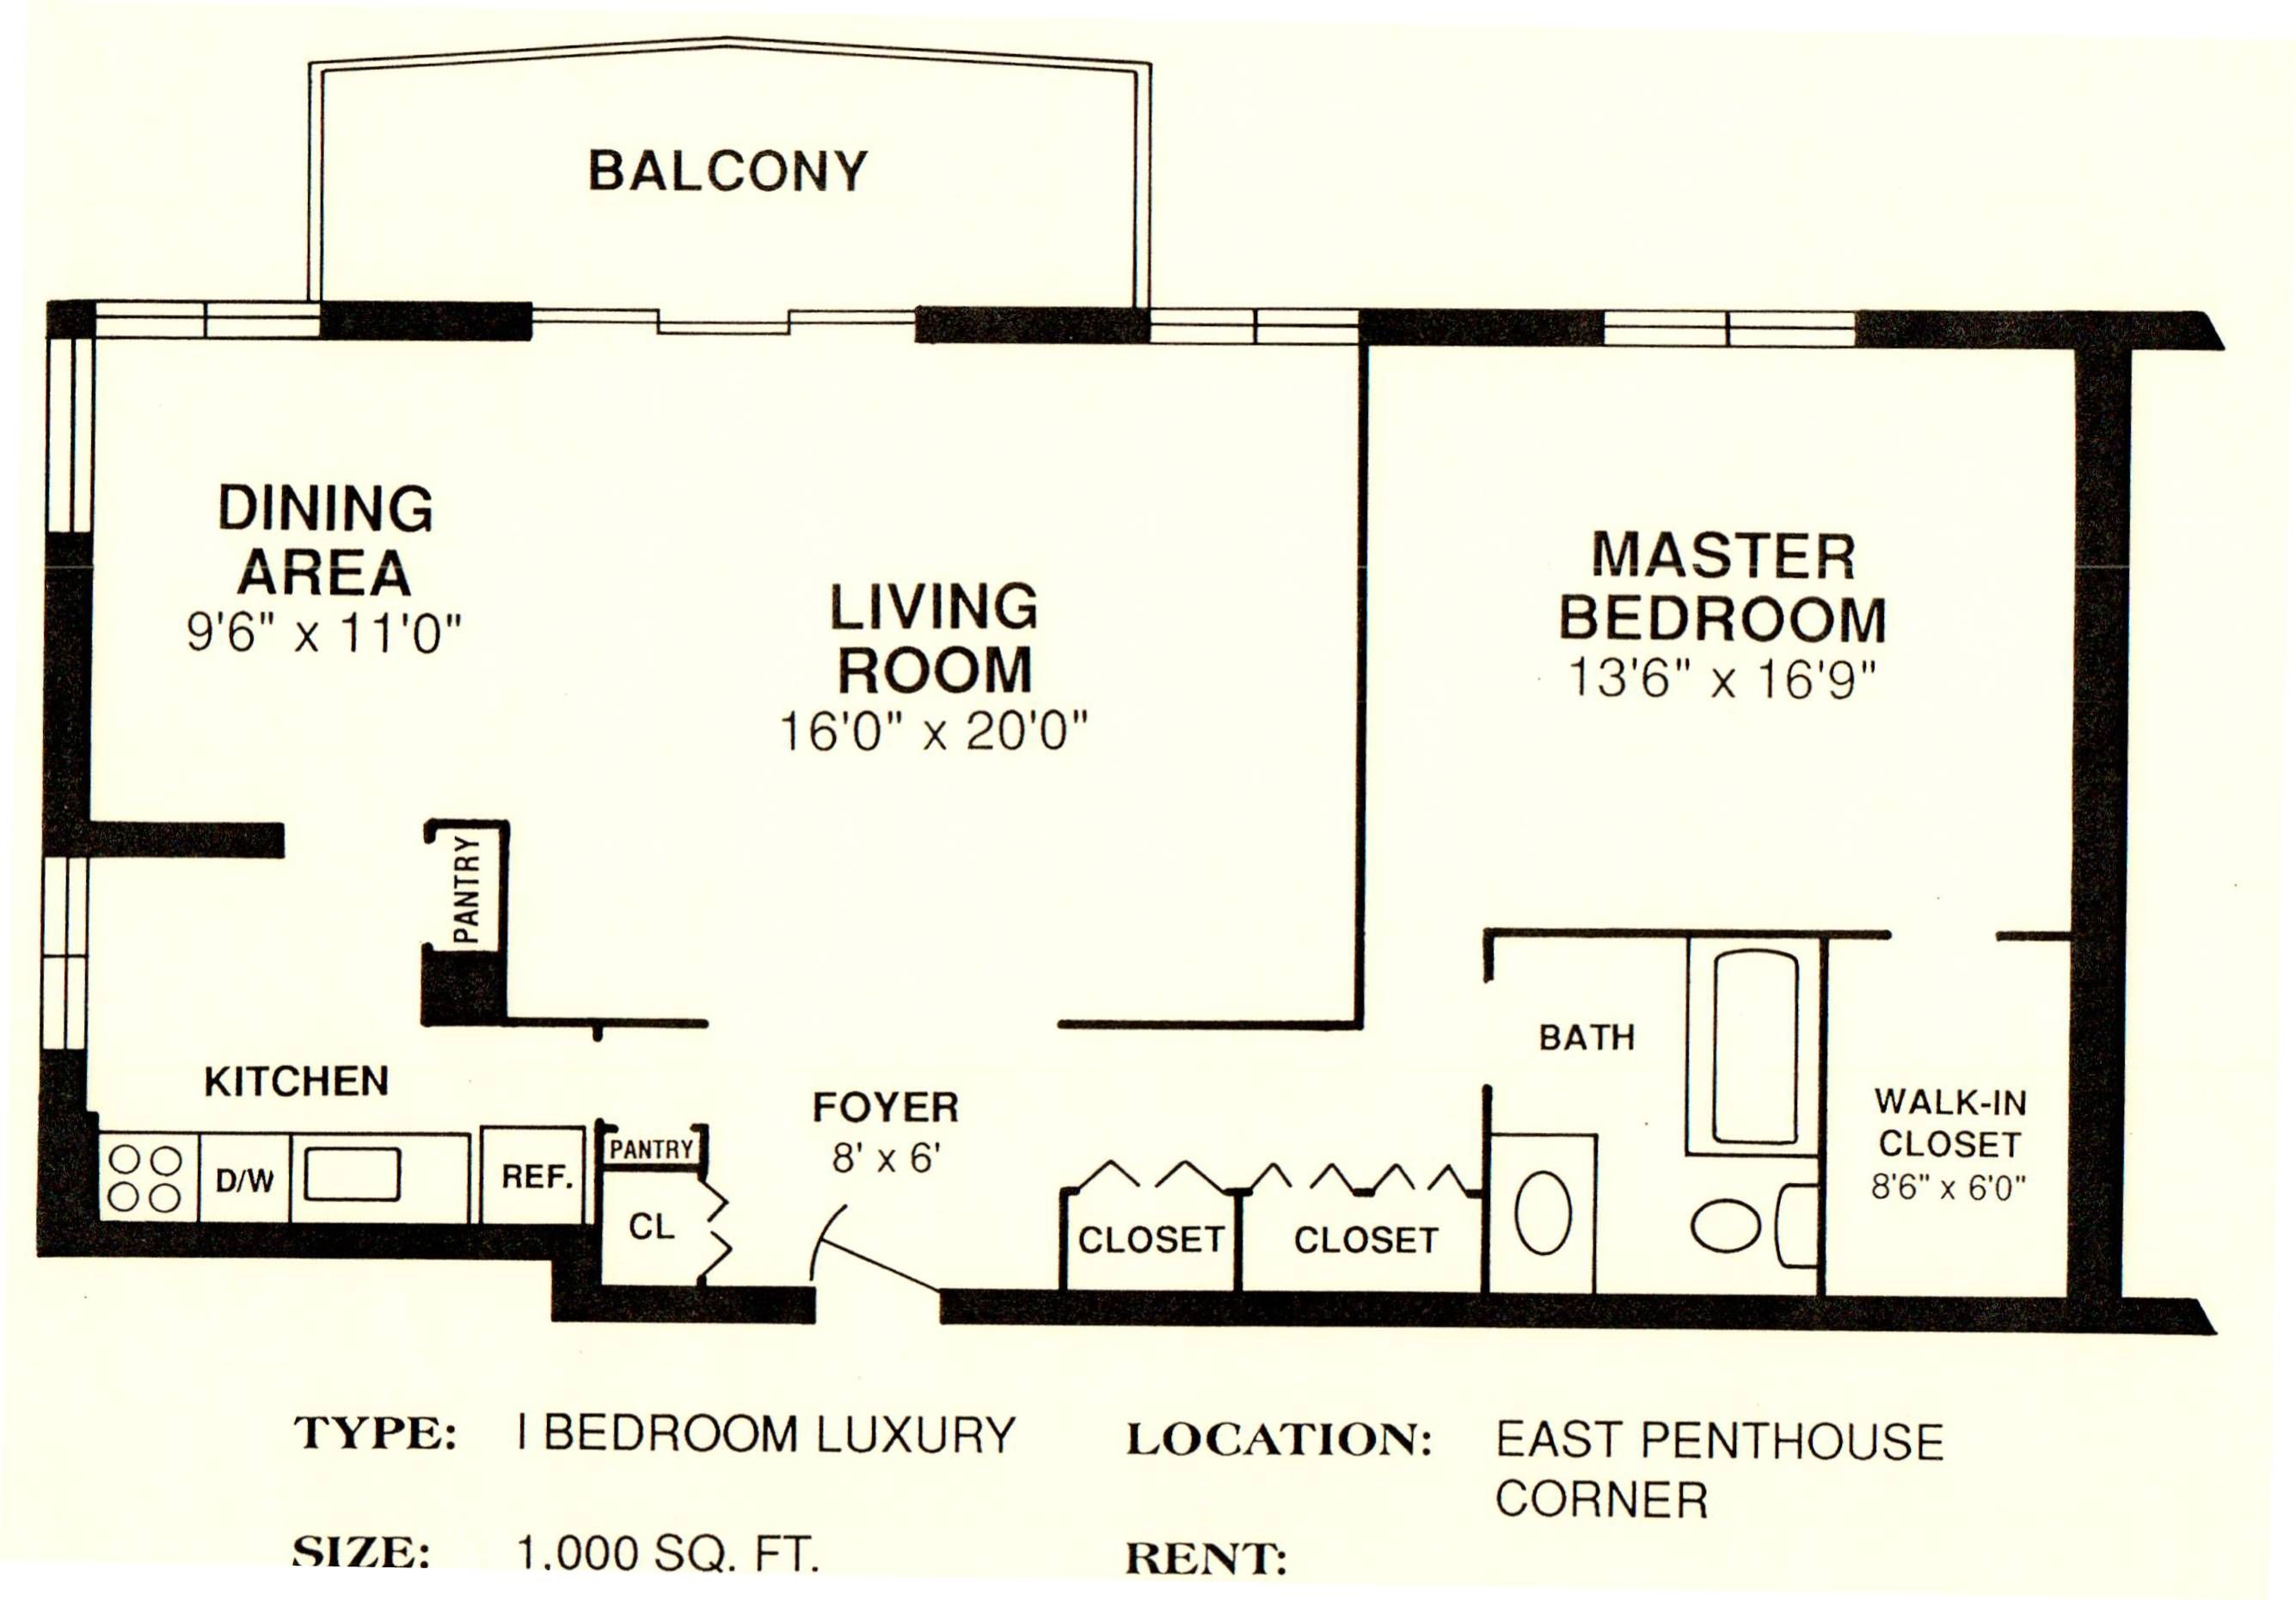 East Penthouse 1 000 Sq Ft Luxurious Bedrooms Penthouse Floor Plans